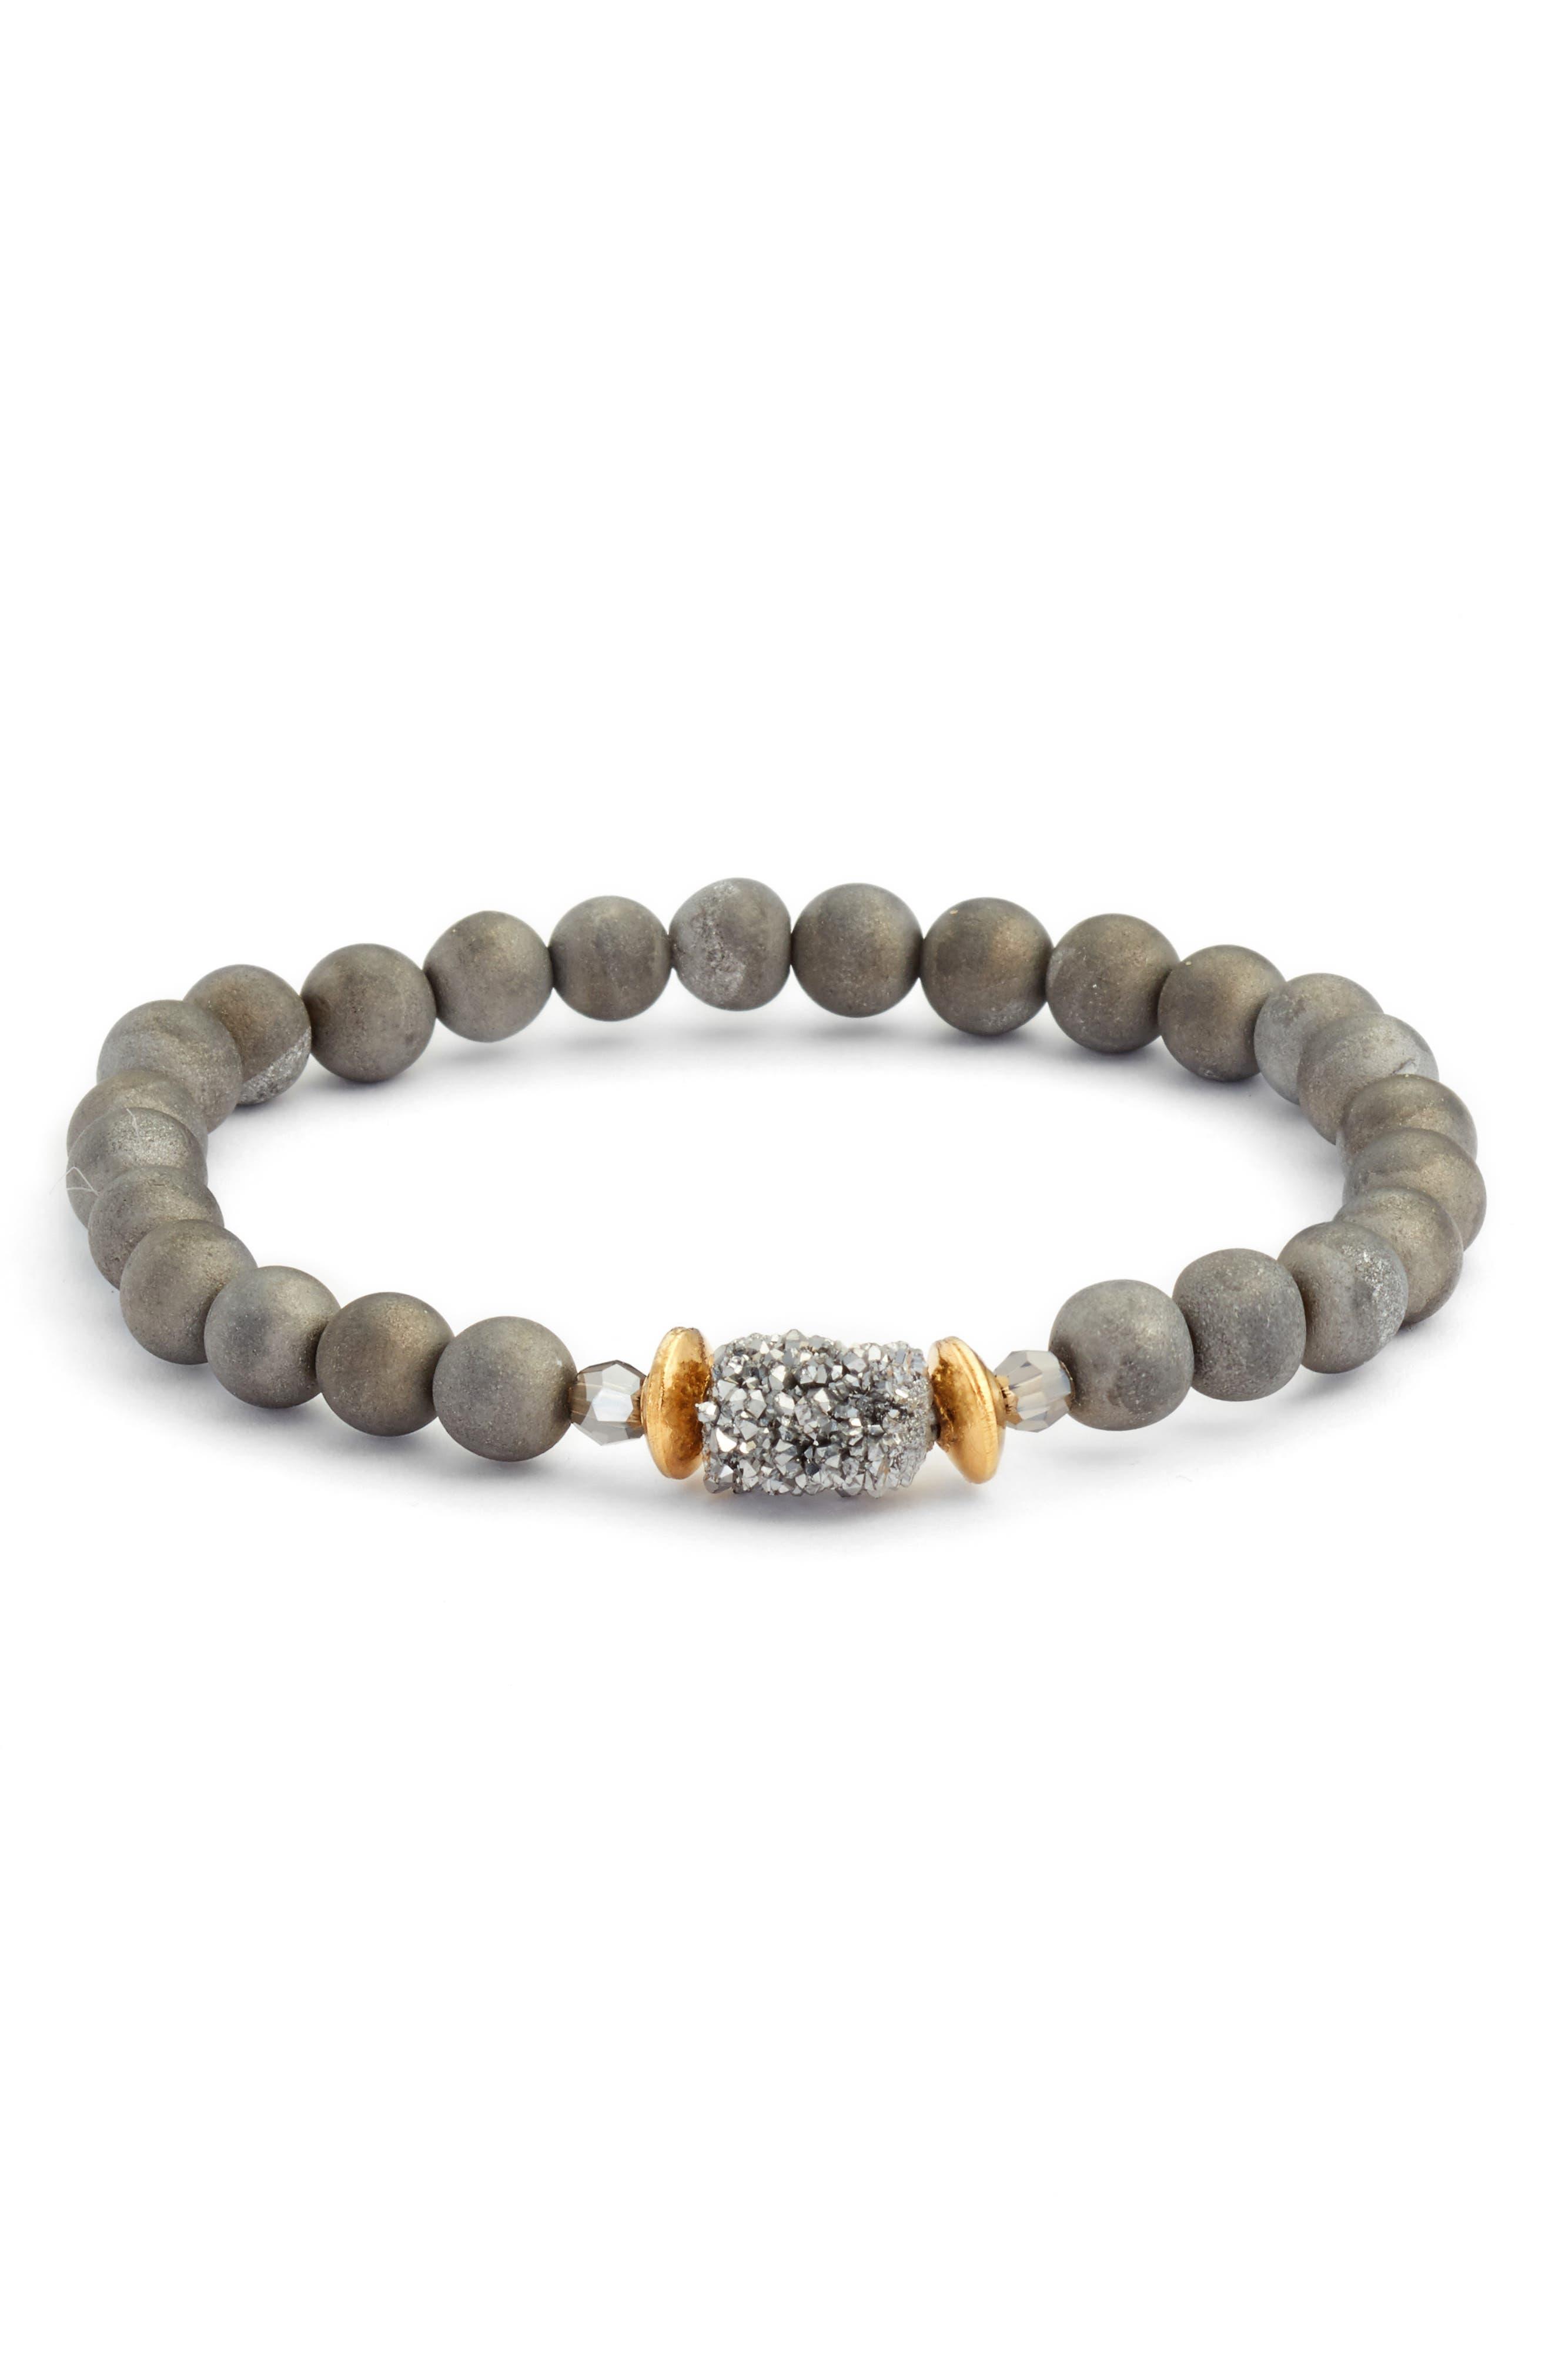 Agate Stretch Bracelet,                         Main,                         color,